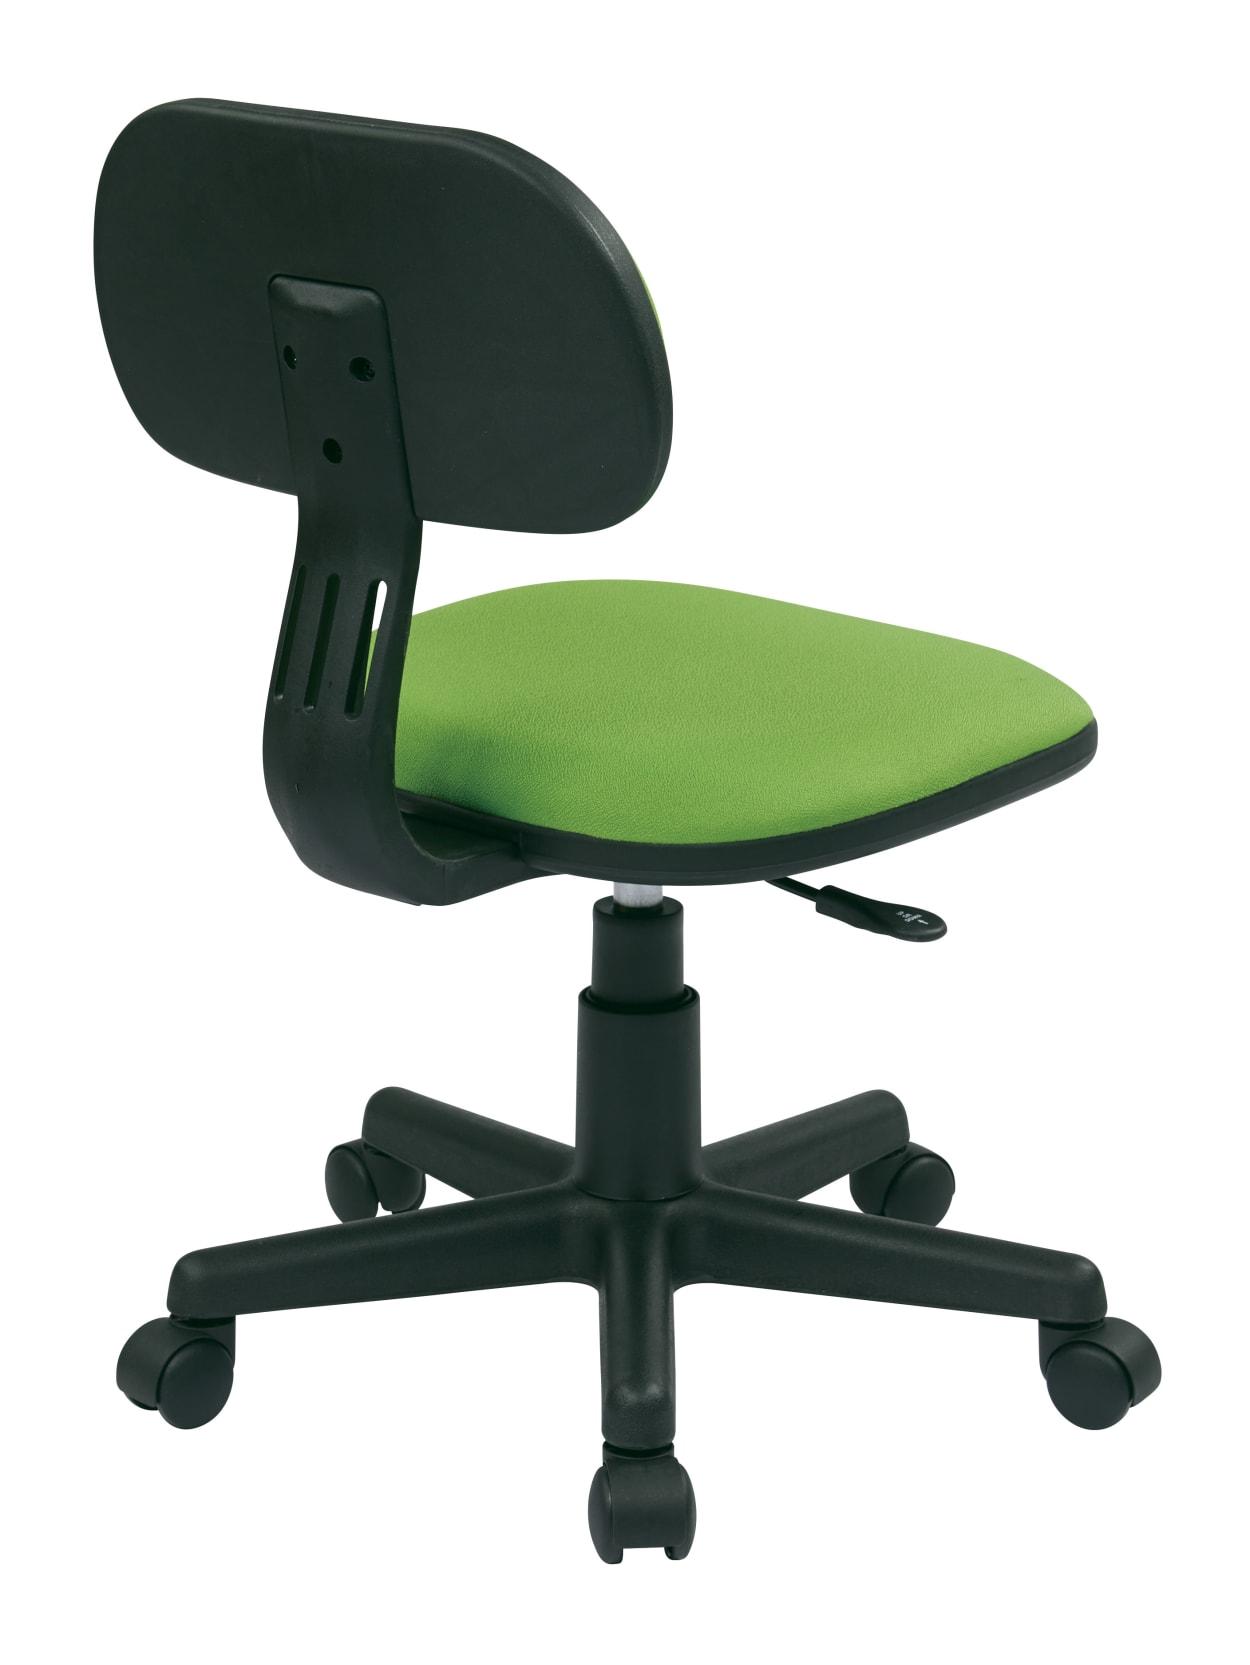 Office Star Student Task Chair Green - Office Depot